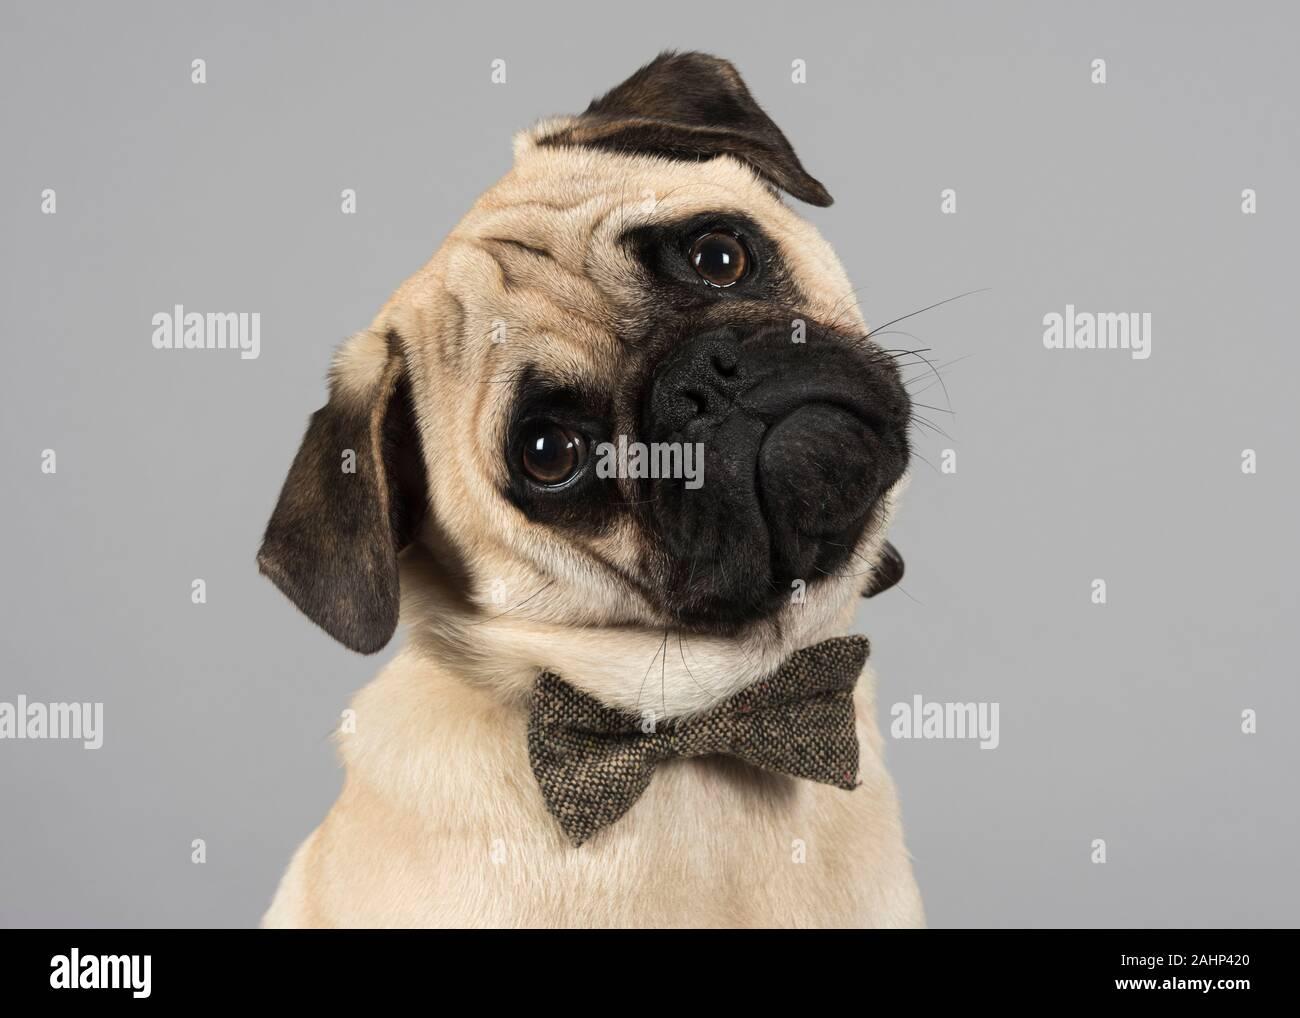 Male, Pug puppy, UK Stock Photo